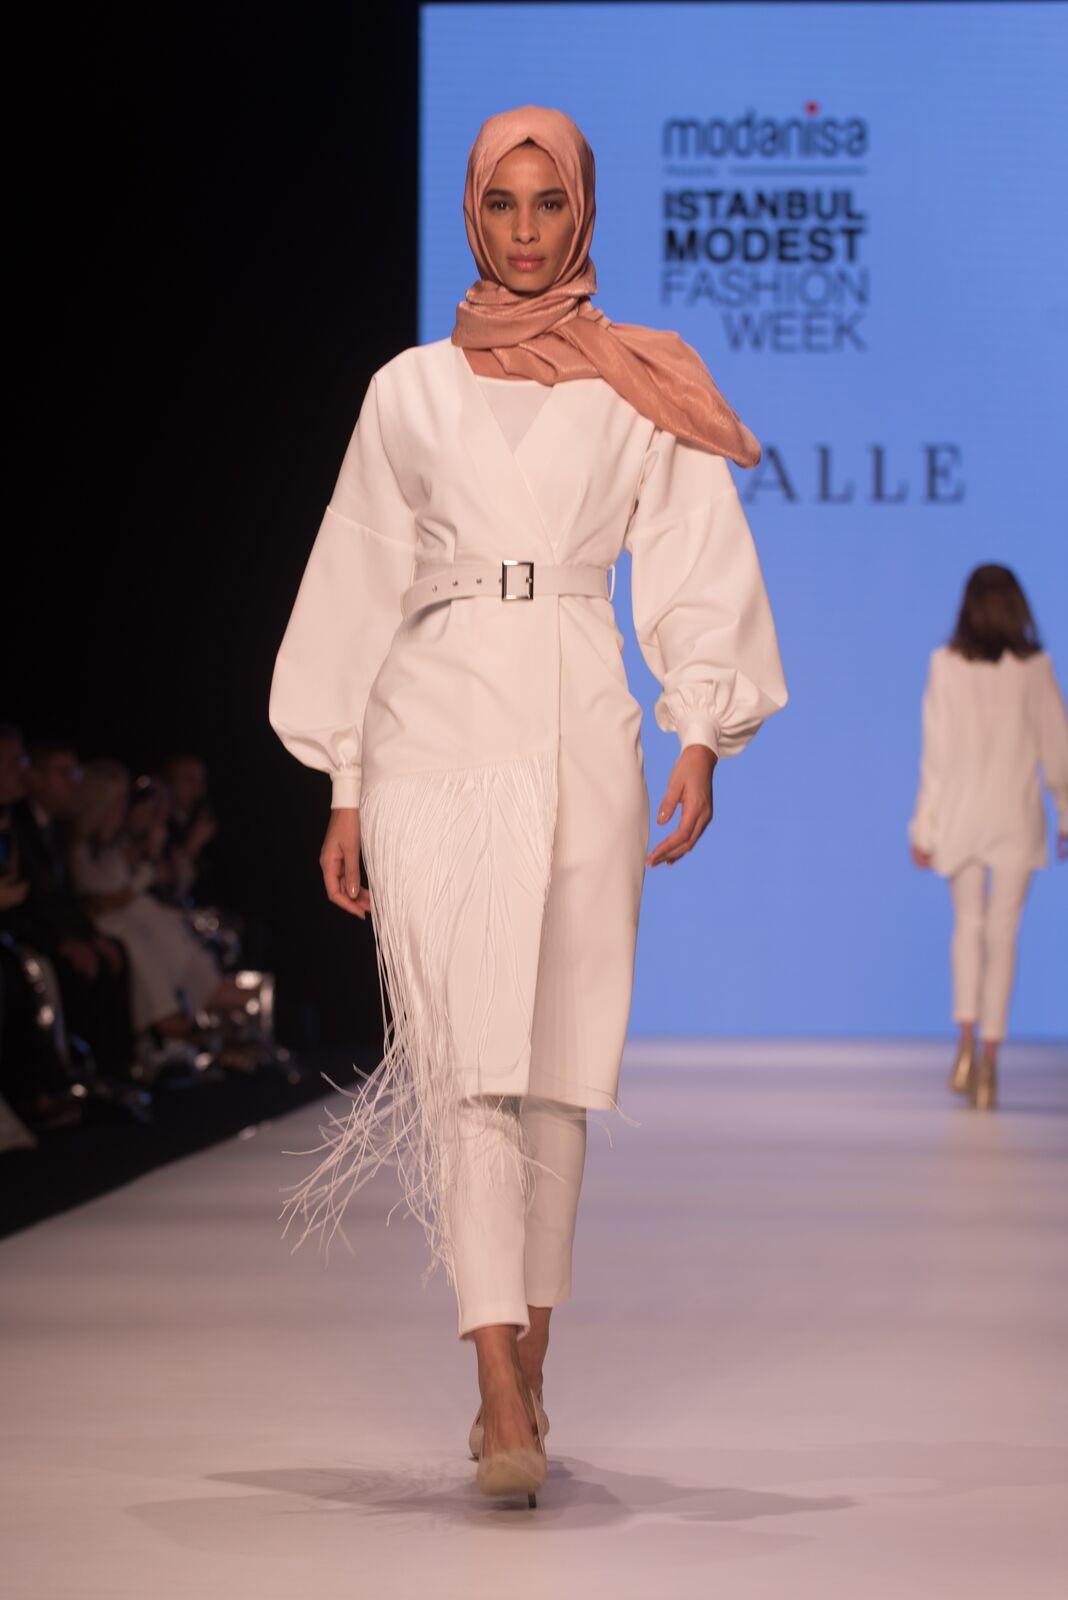 Mizalle at istanbul modest fashion week 2019 day 2